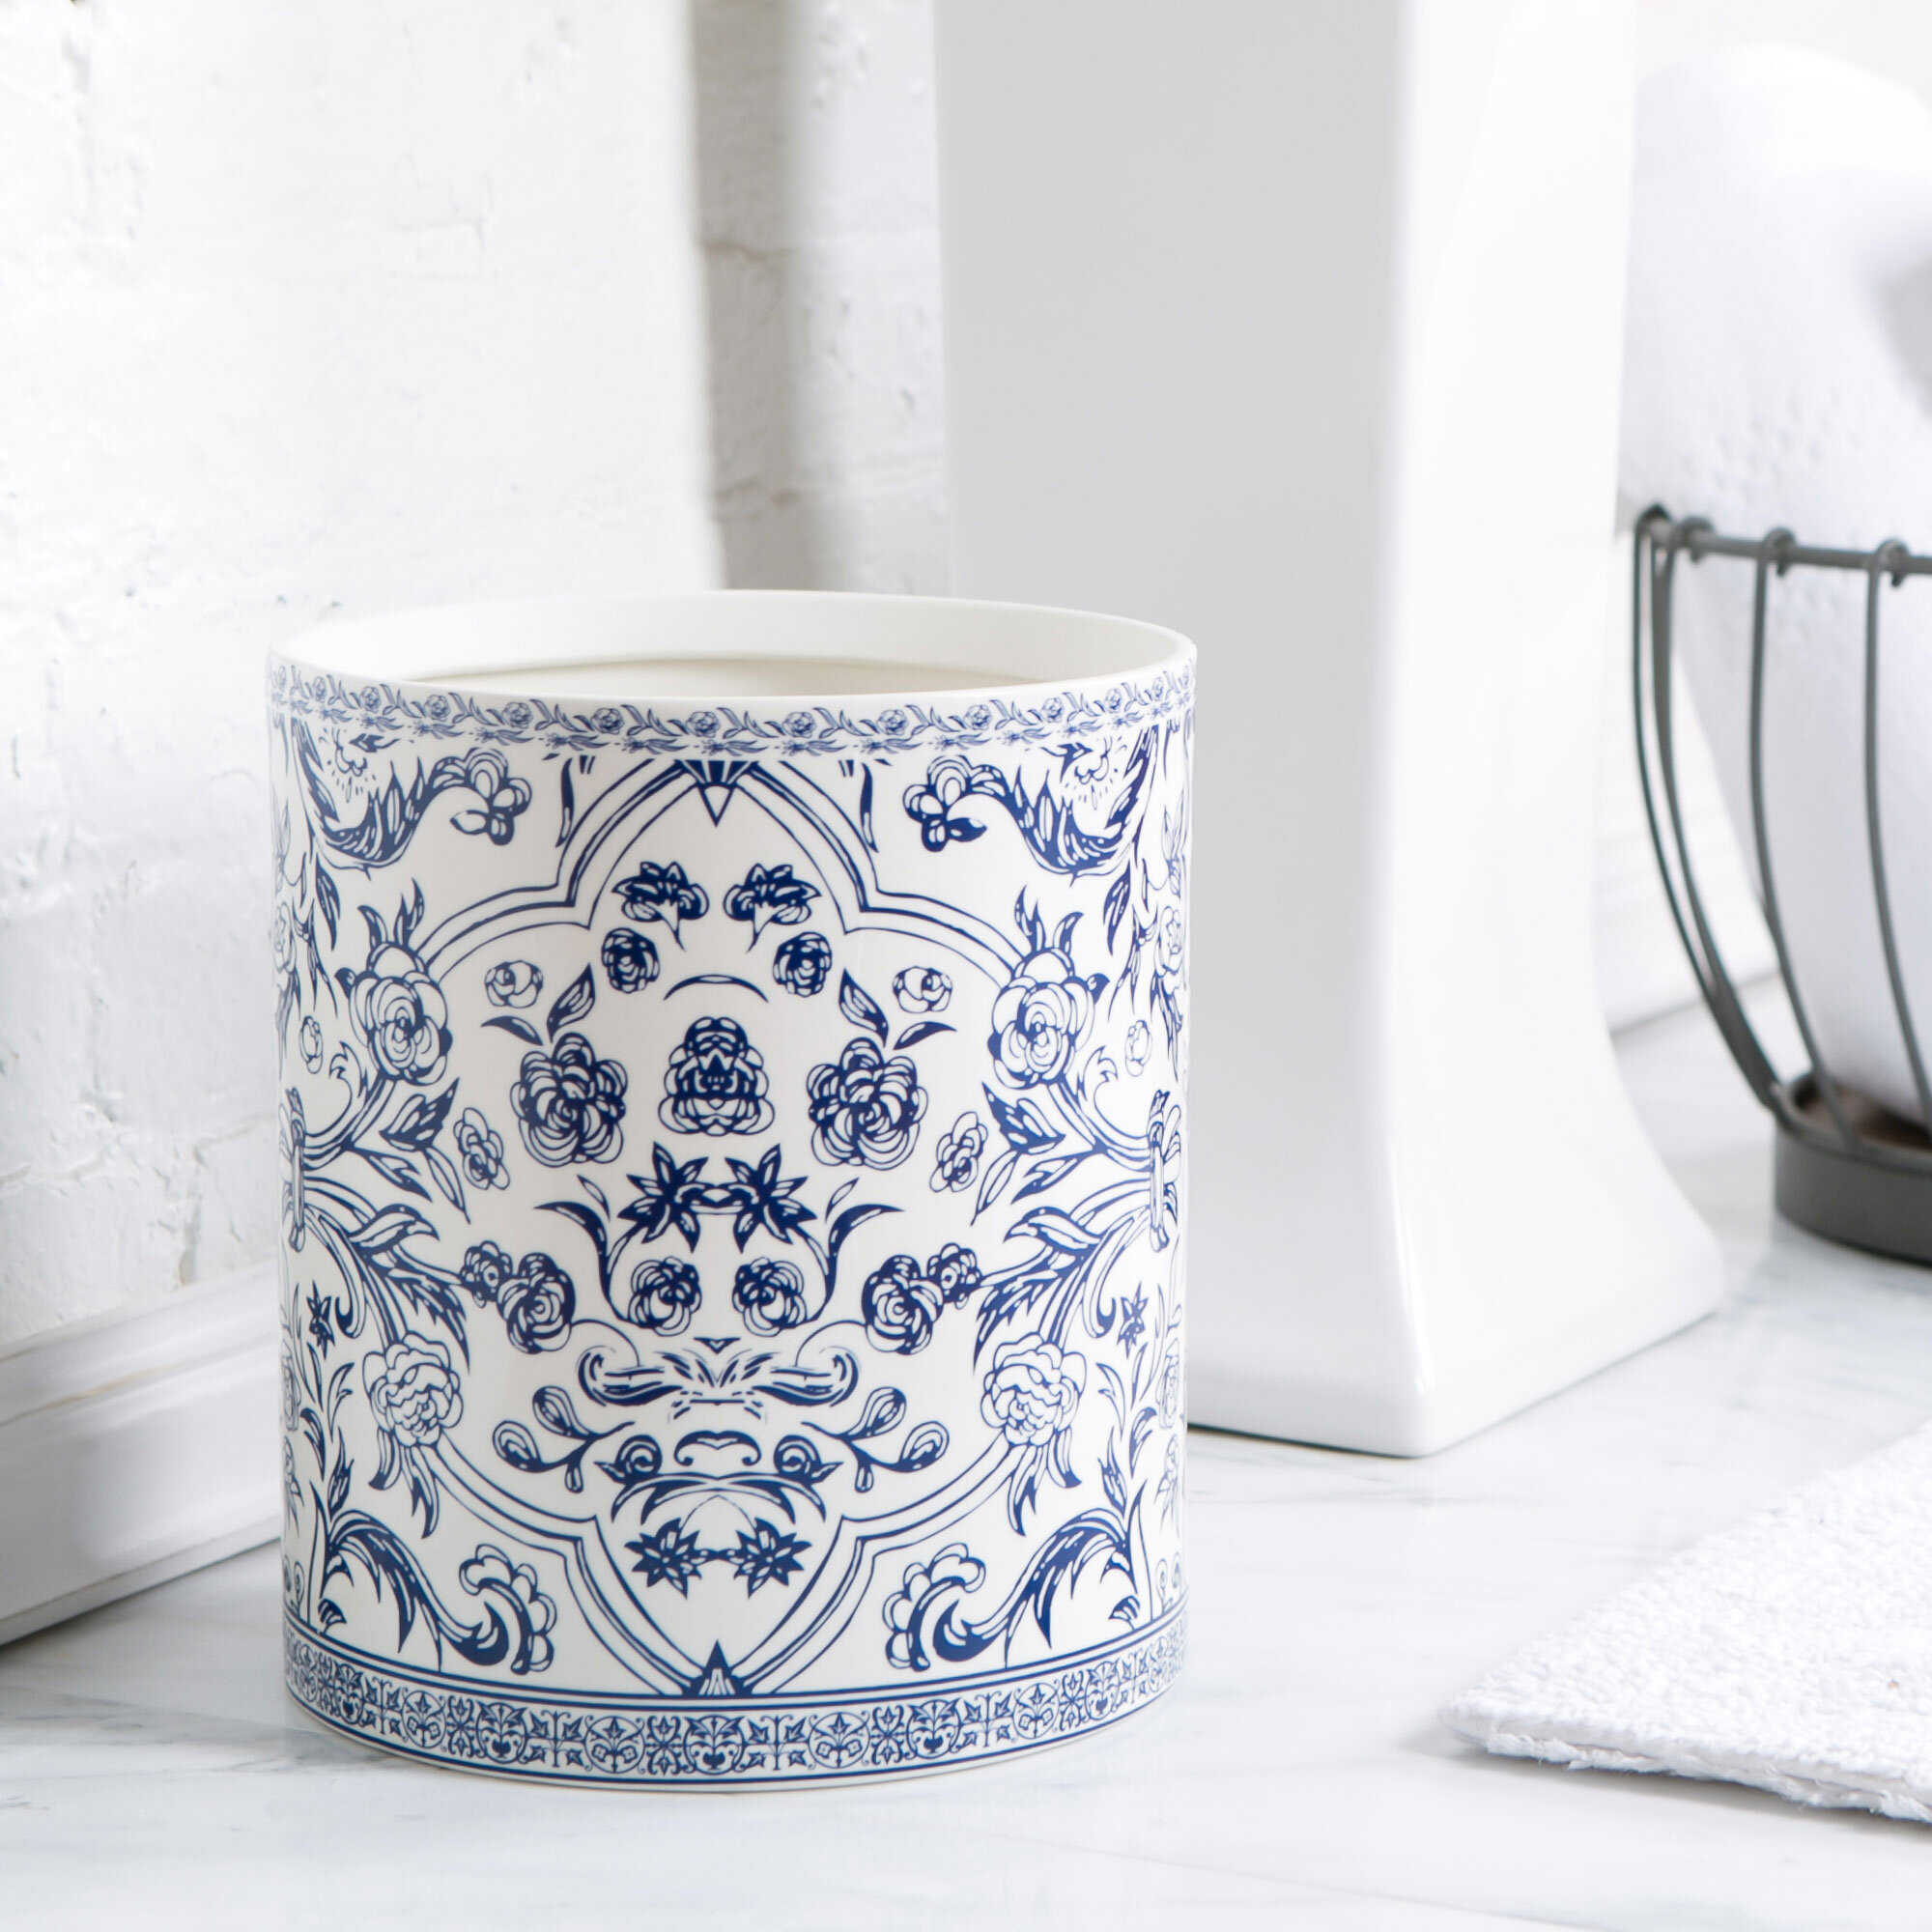 Birch Lane Porcelain Bathroom Accessories Blue White Waste Basket Reviews